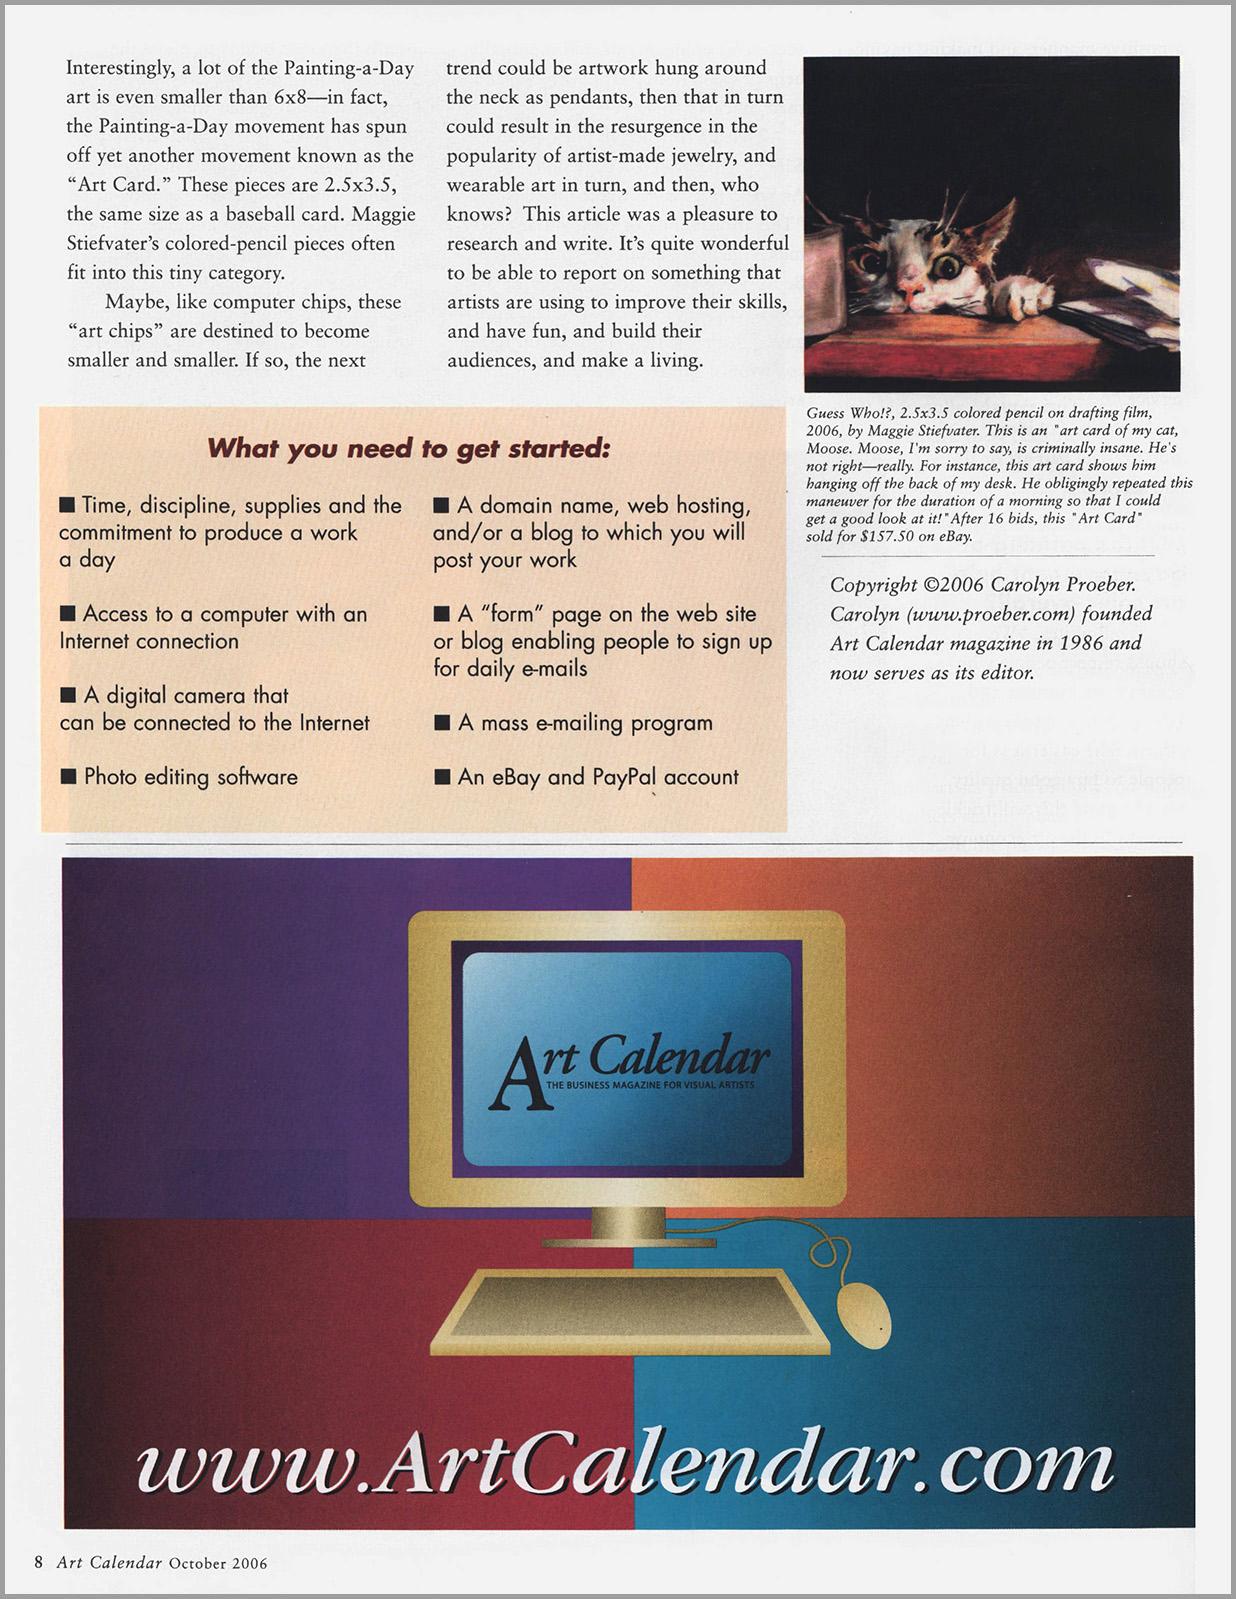 AC 2006 Page 6.jpg